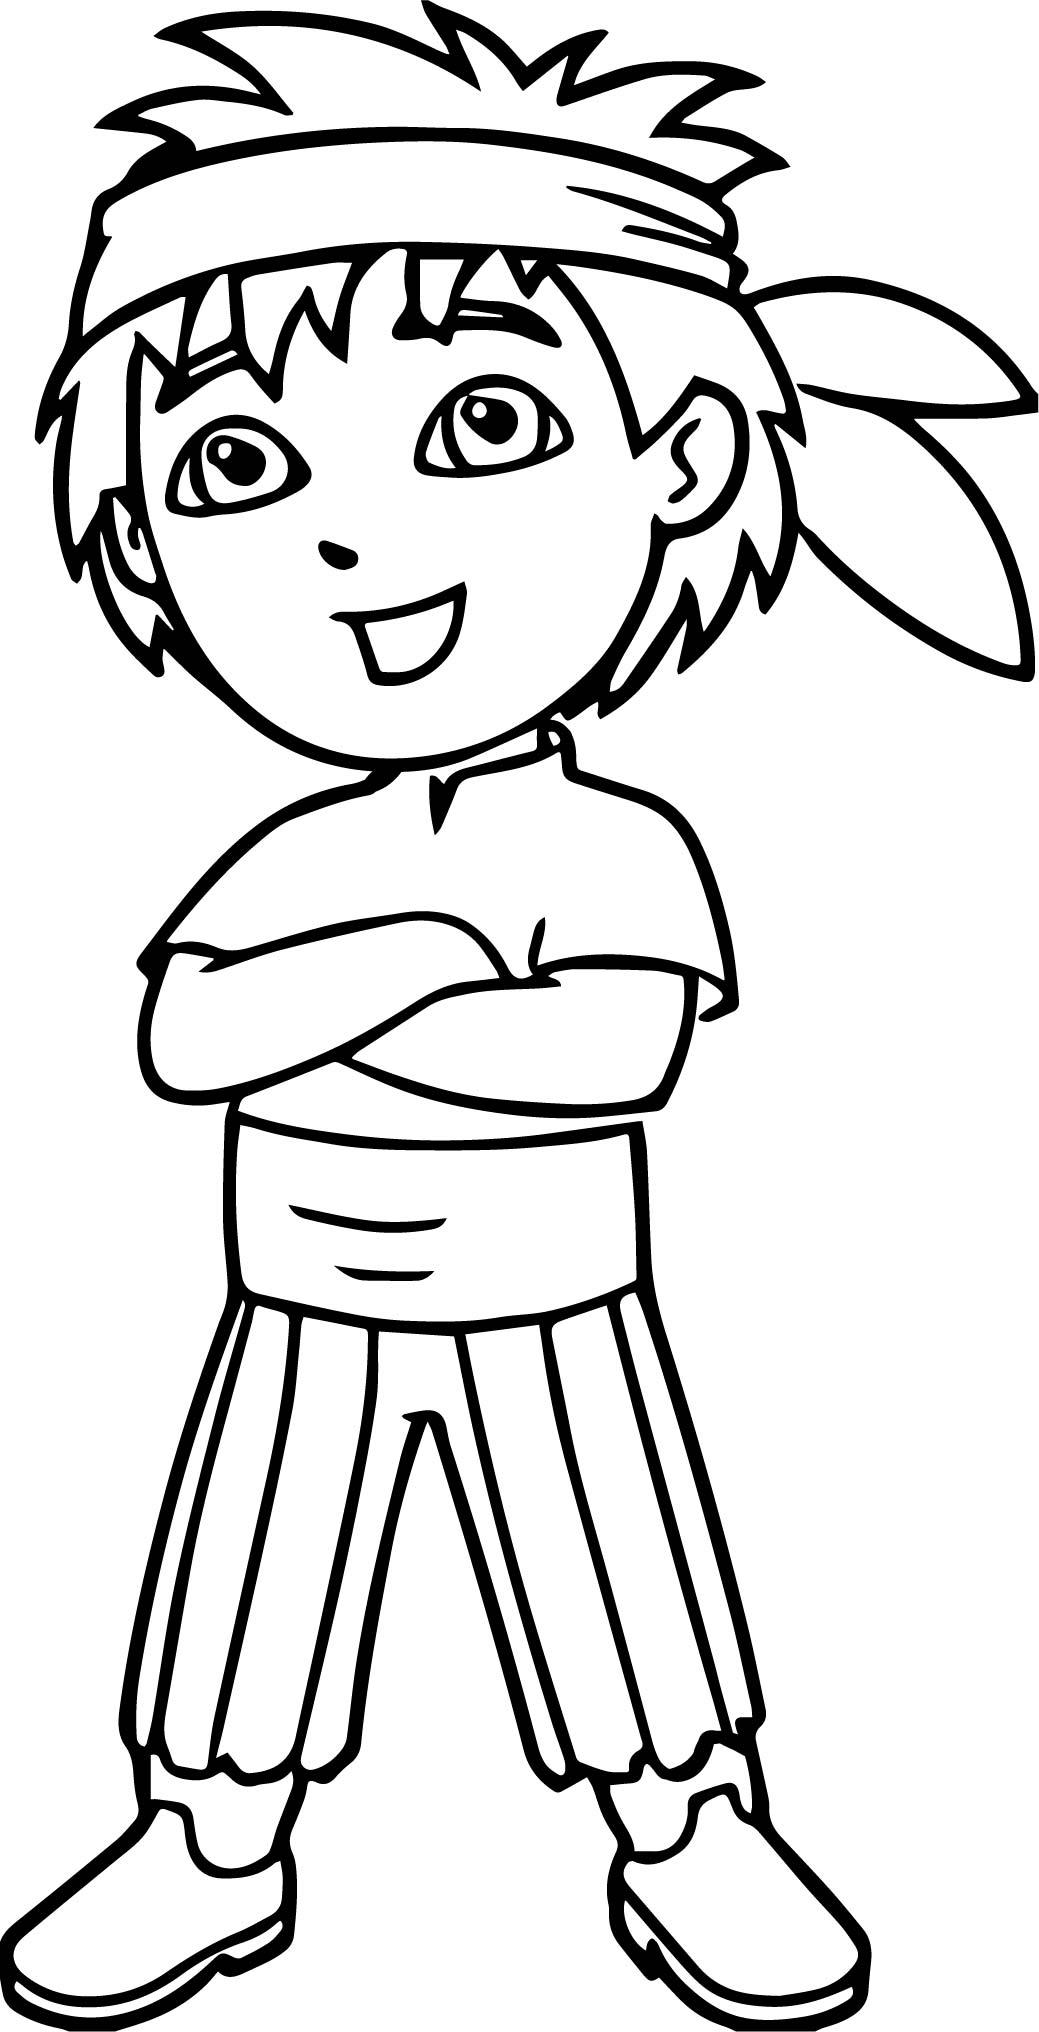 Kid Dora The Explorer Man Cartoon Coloring Page